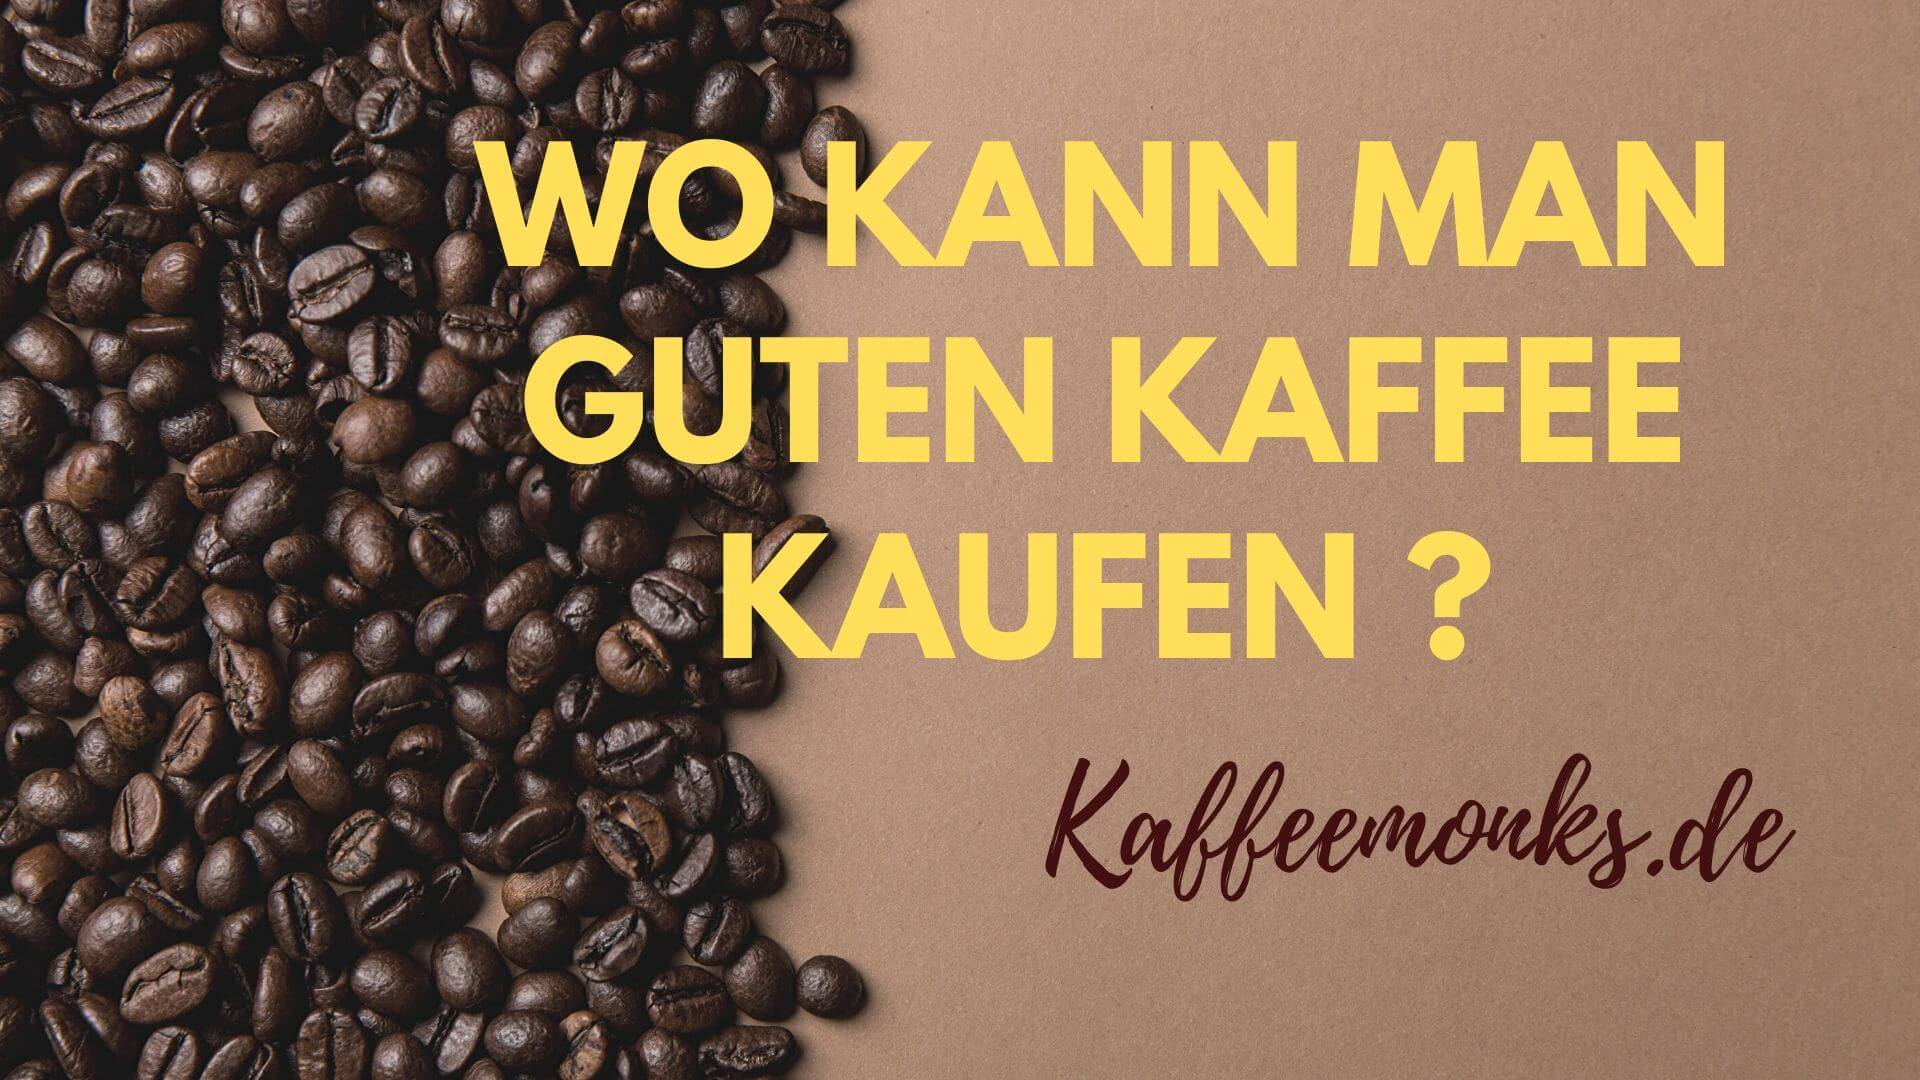 You are currently viewing WO KANN ICH GUTEN KAFFEE KAUFEN